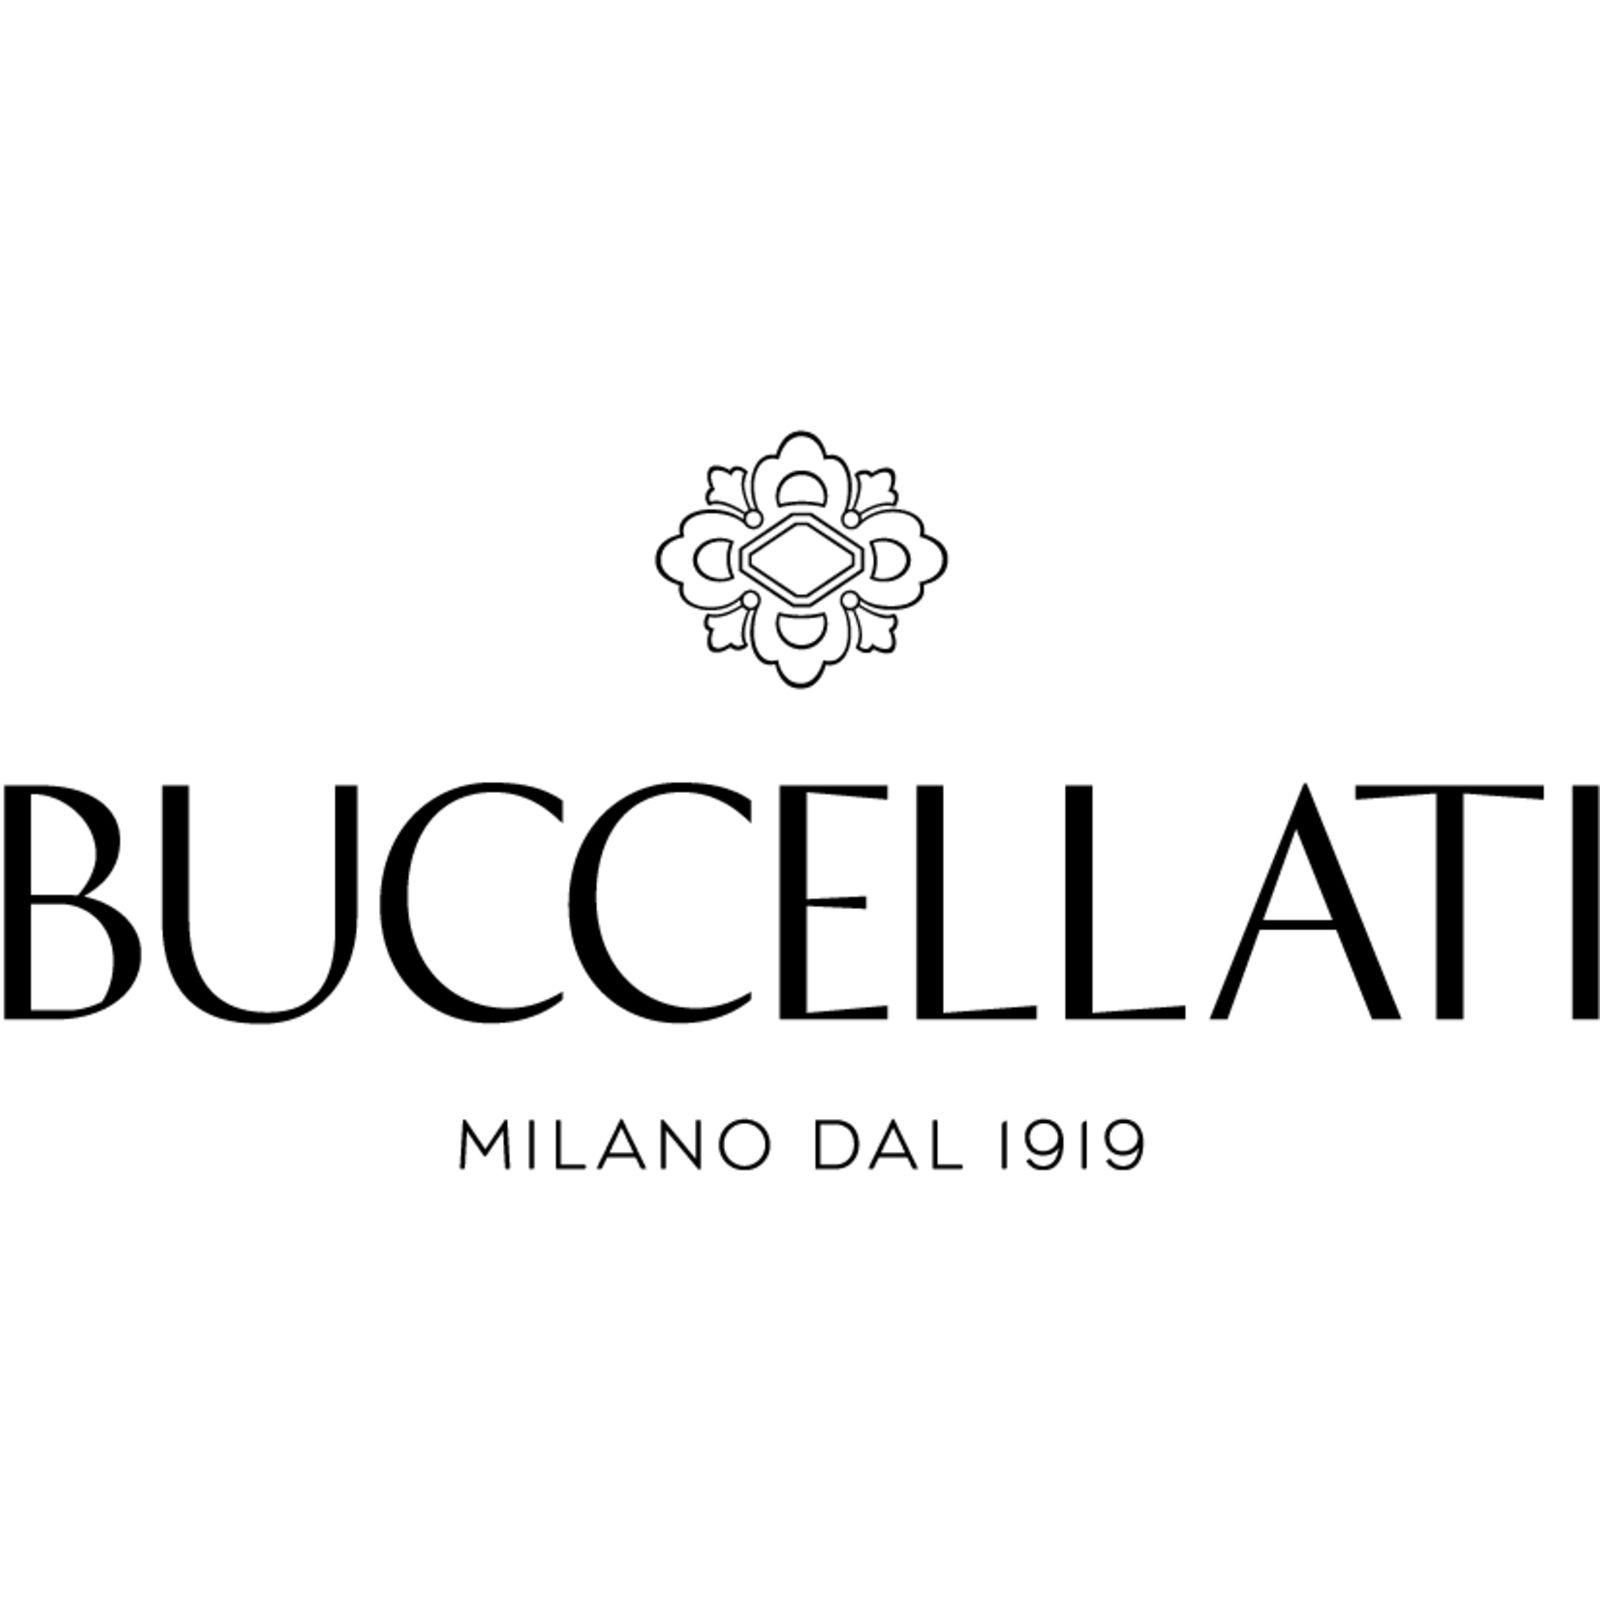 BUCCELLATI